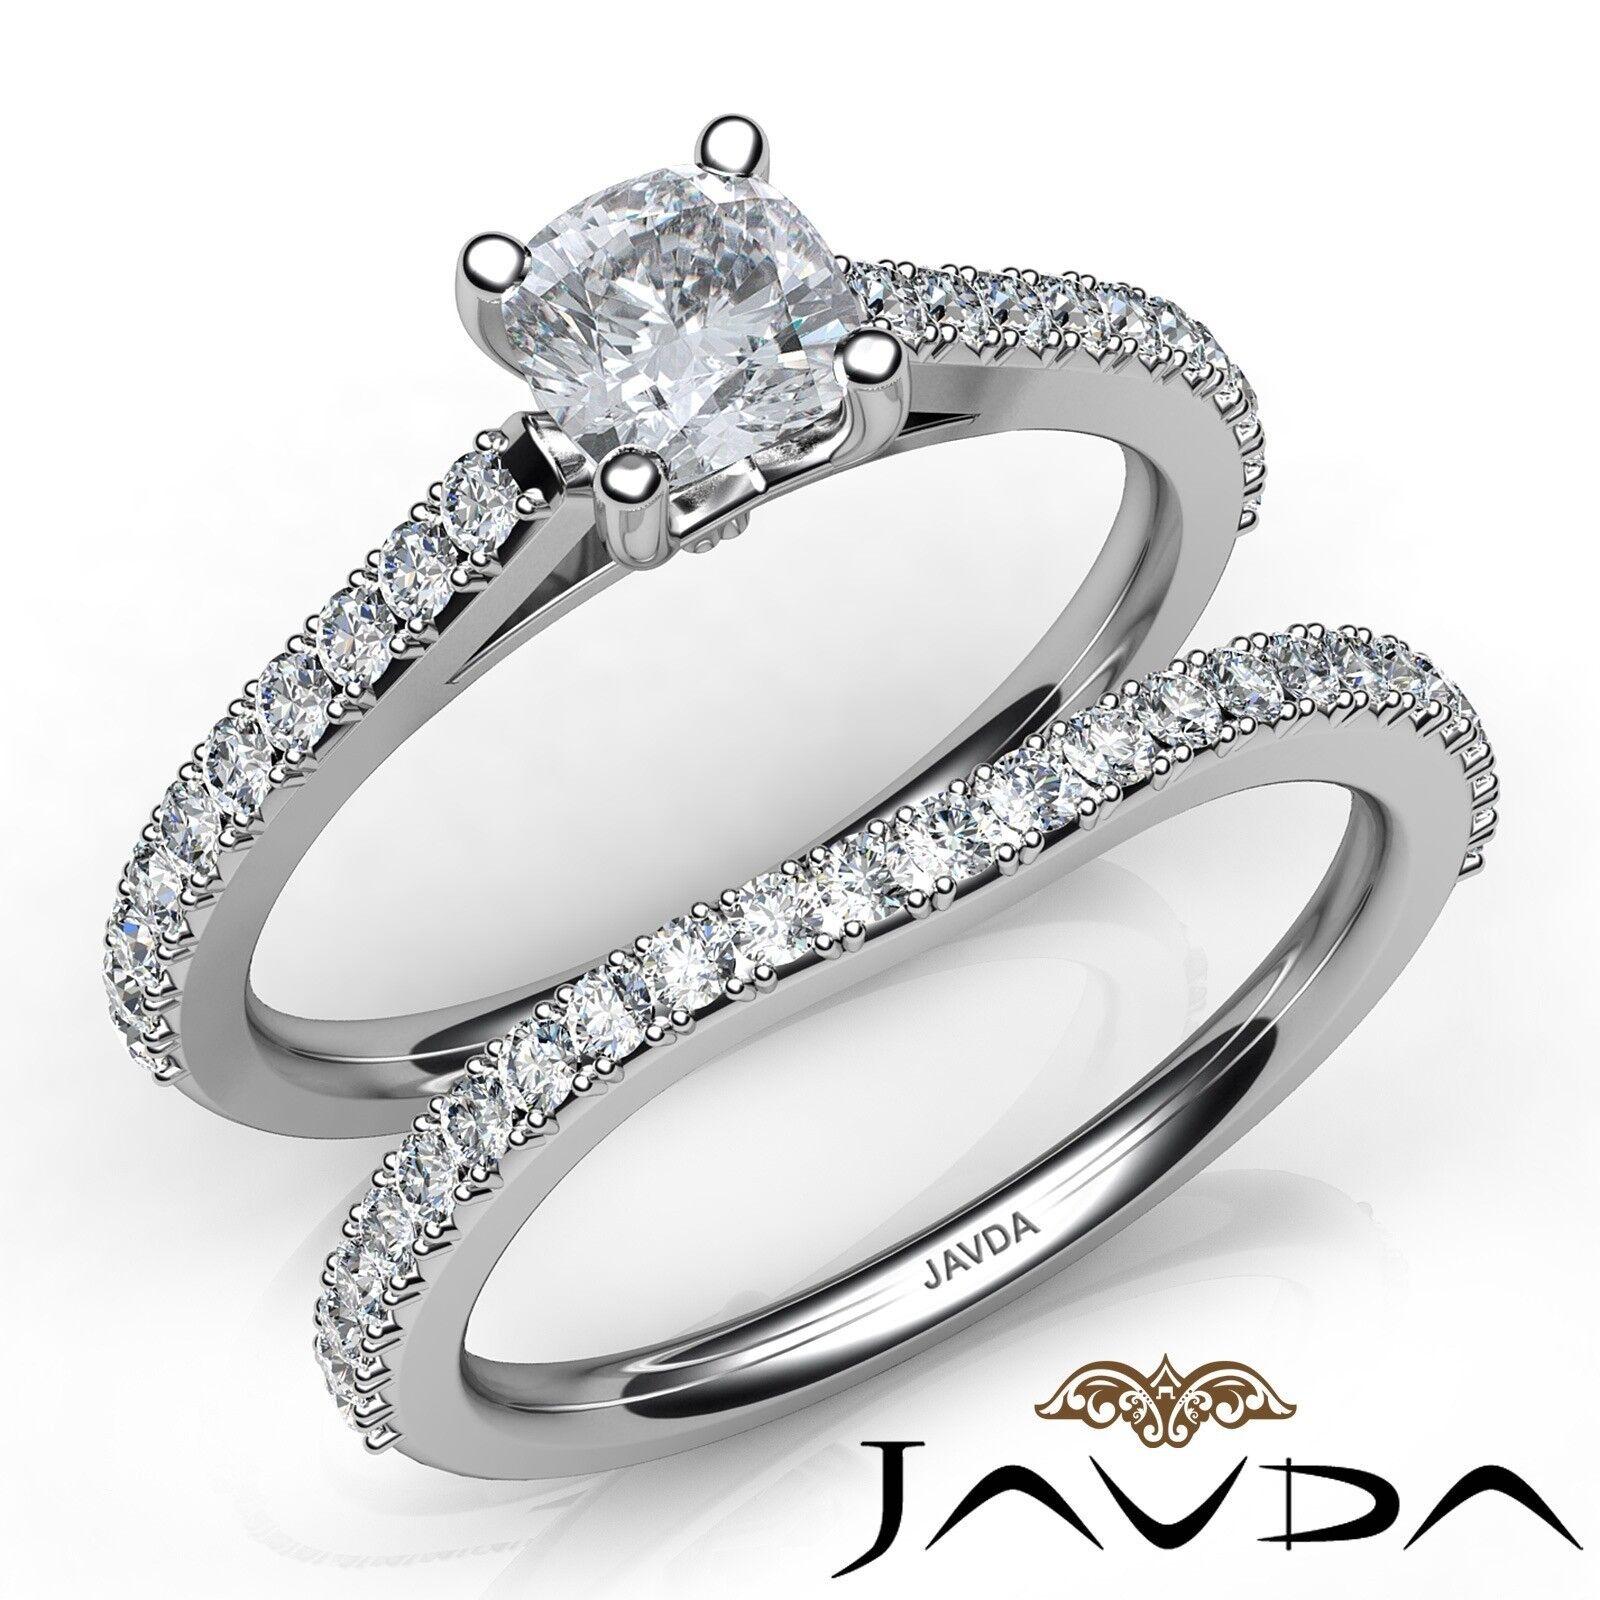 1.51ctw Double Prong Bridal Set Cushion Diamond Engagement Ring GIA F-VS1 W Gold